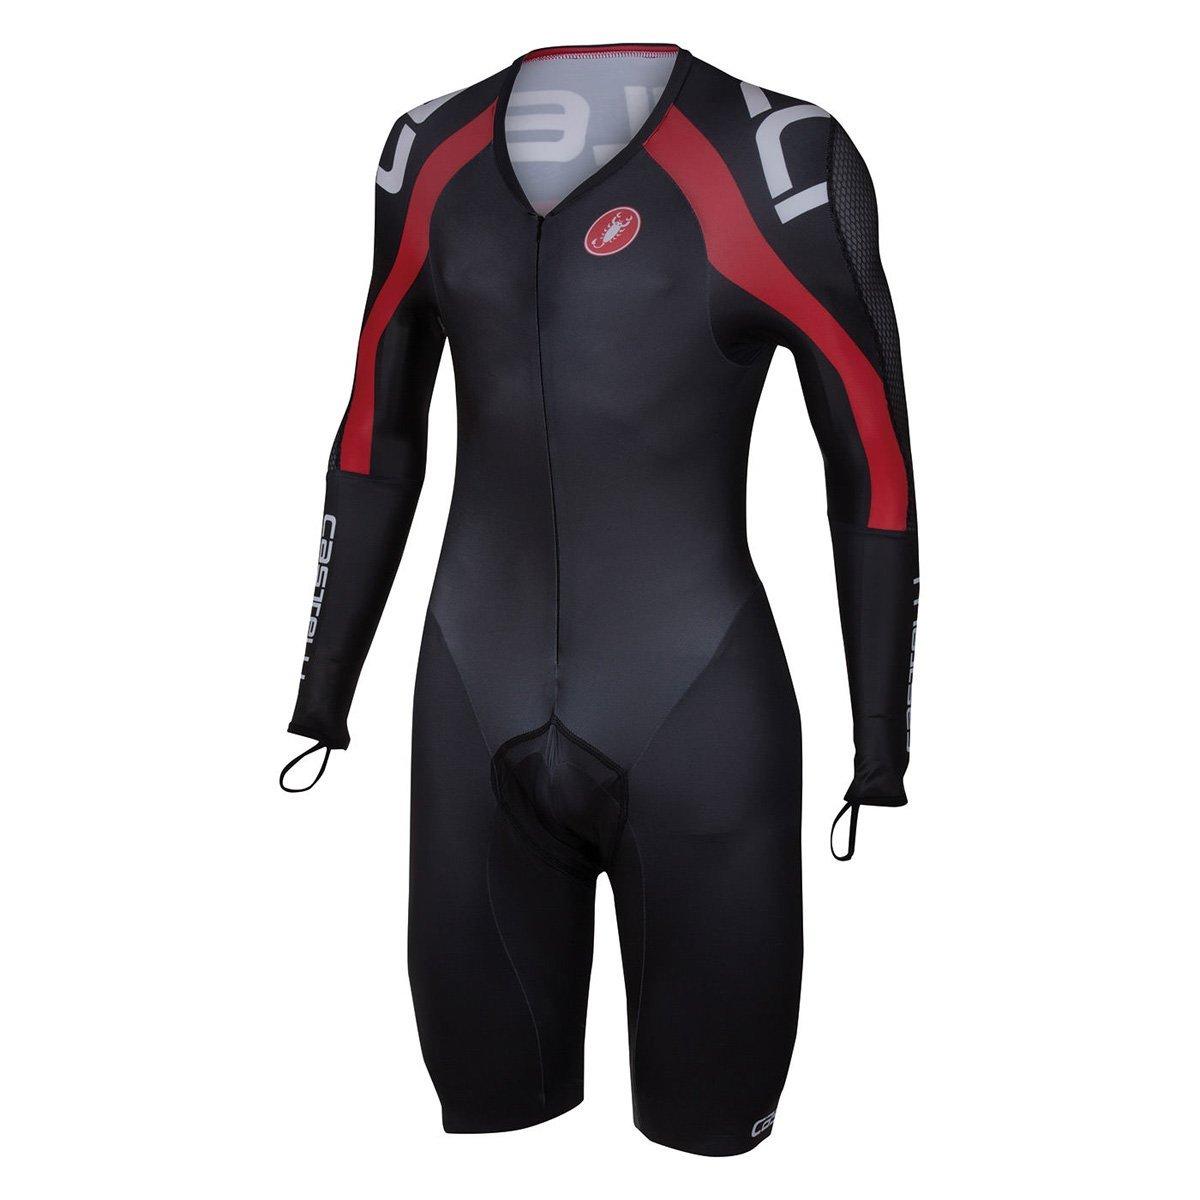 279c018ed Buy castelli mens body paint long sleeve cycling speed suit jpg 1200x1200 Long  sleeve speed suit